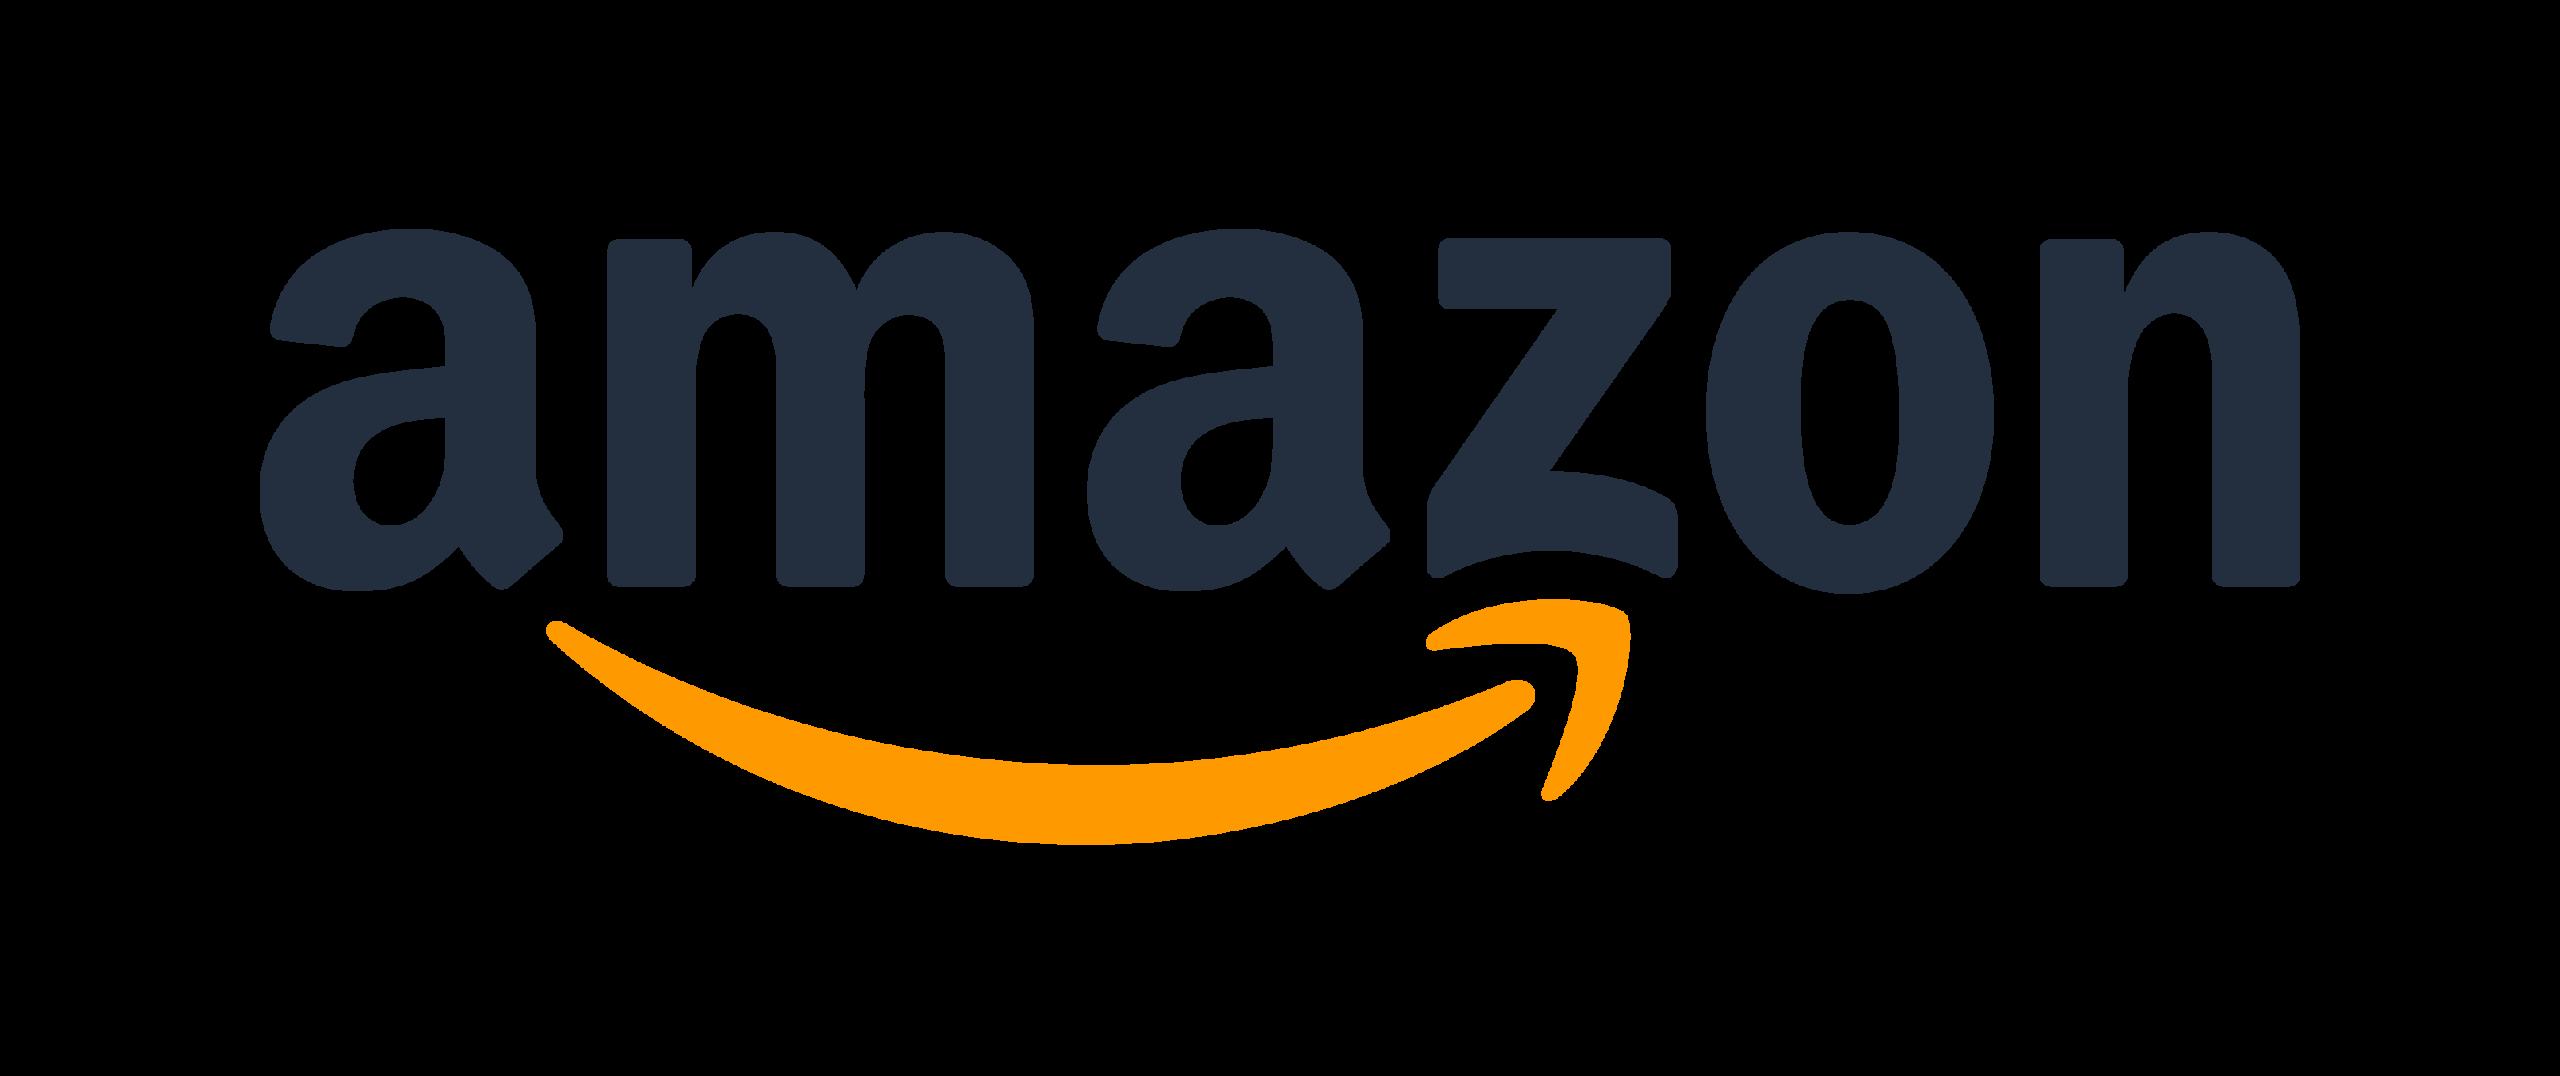 Amazon posts biggest profit despite raging COVID-19 pandemic